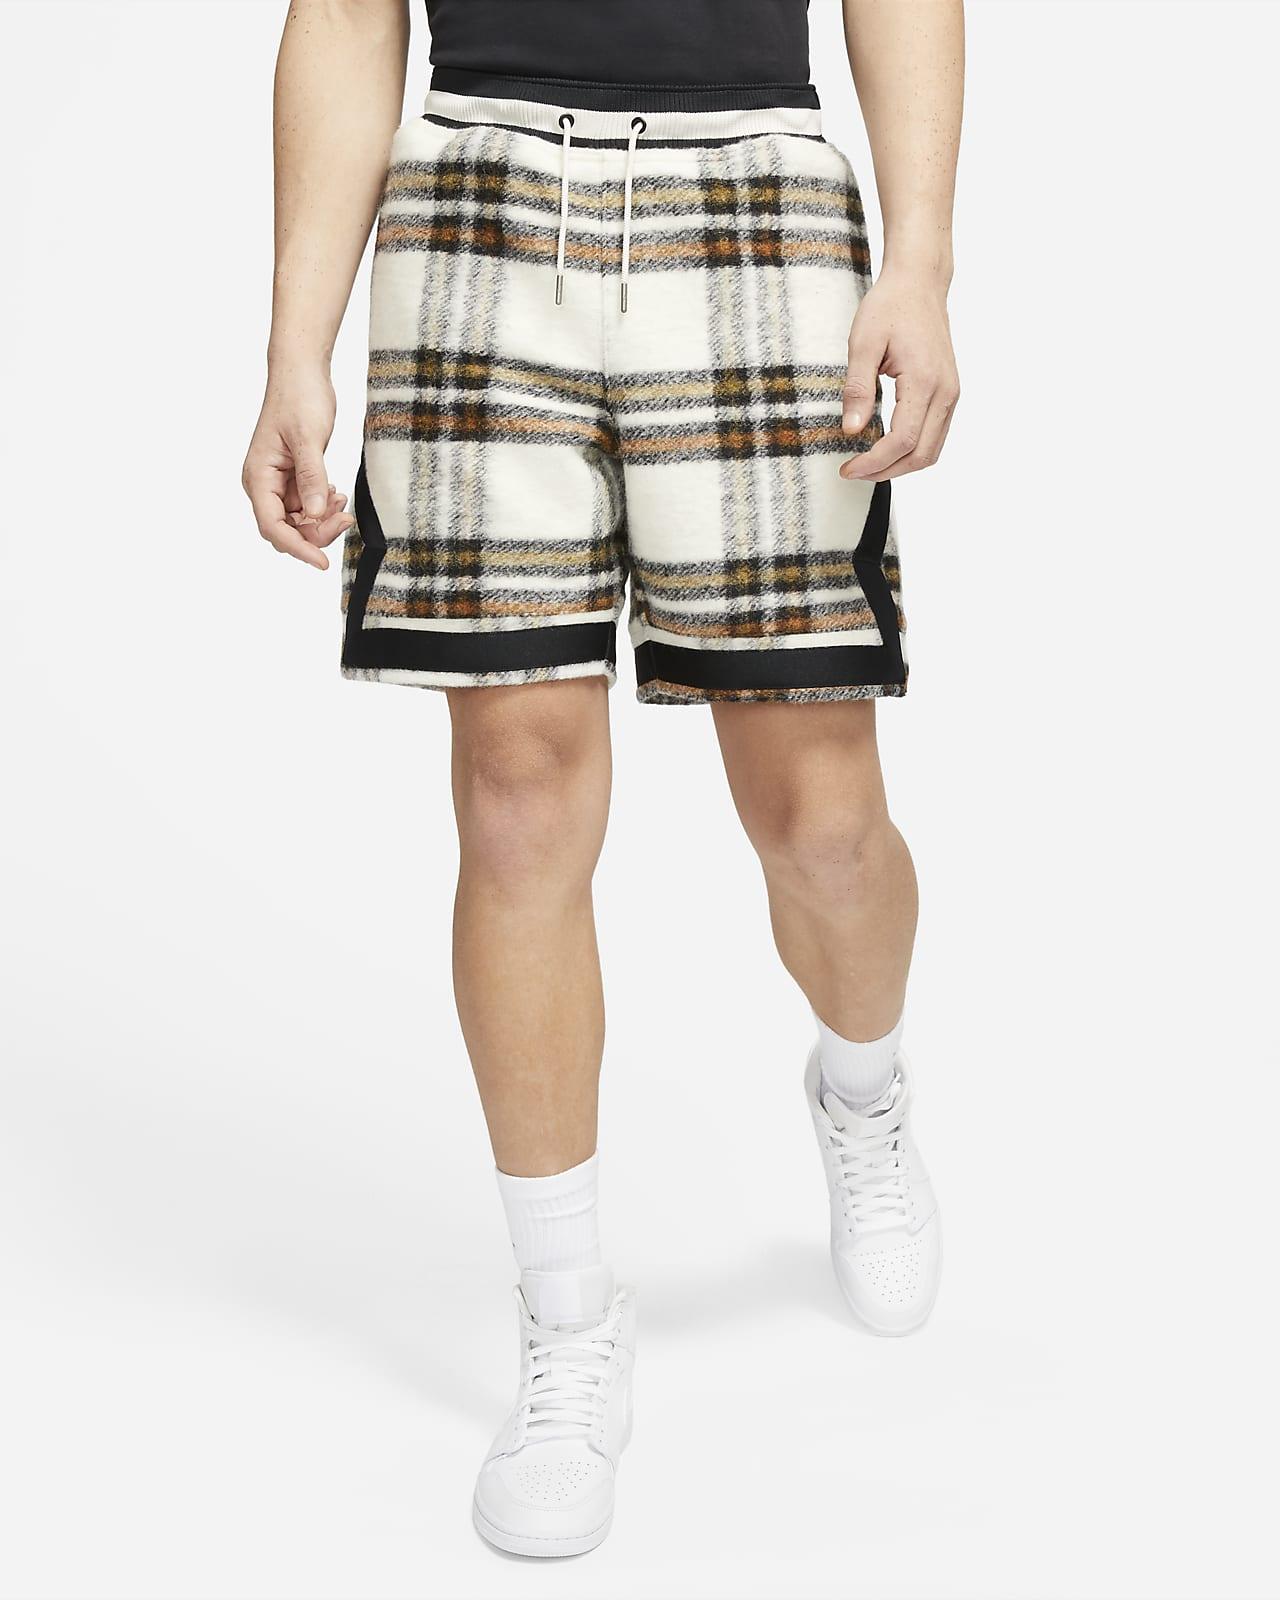 Jordan Why Not? Shorts de lana para hombre